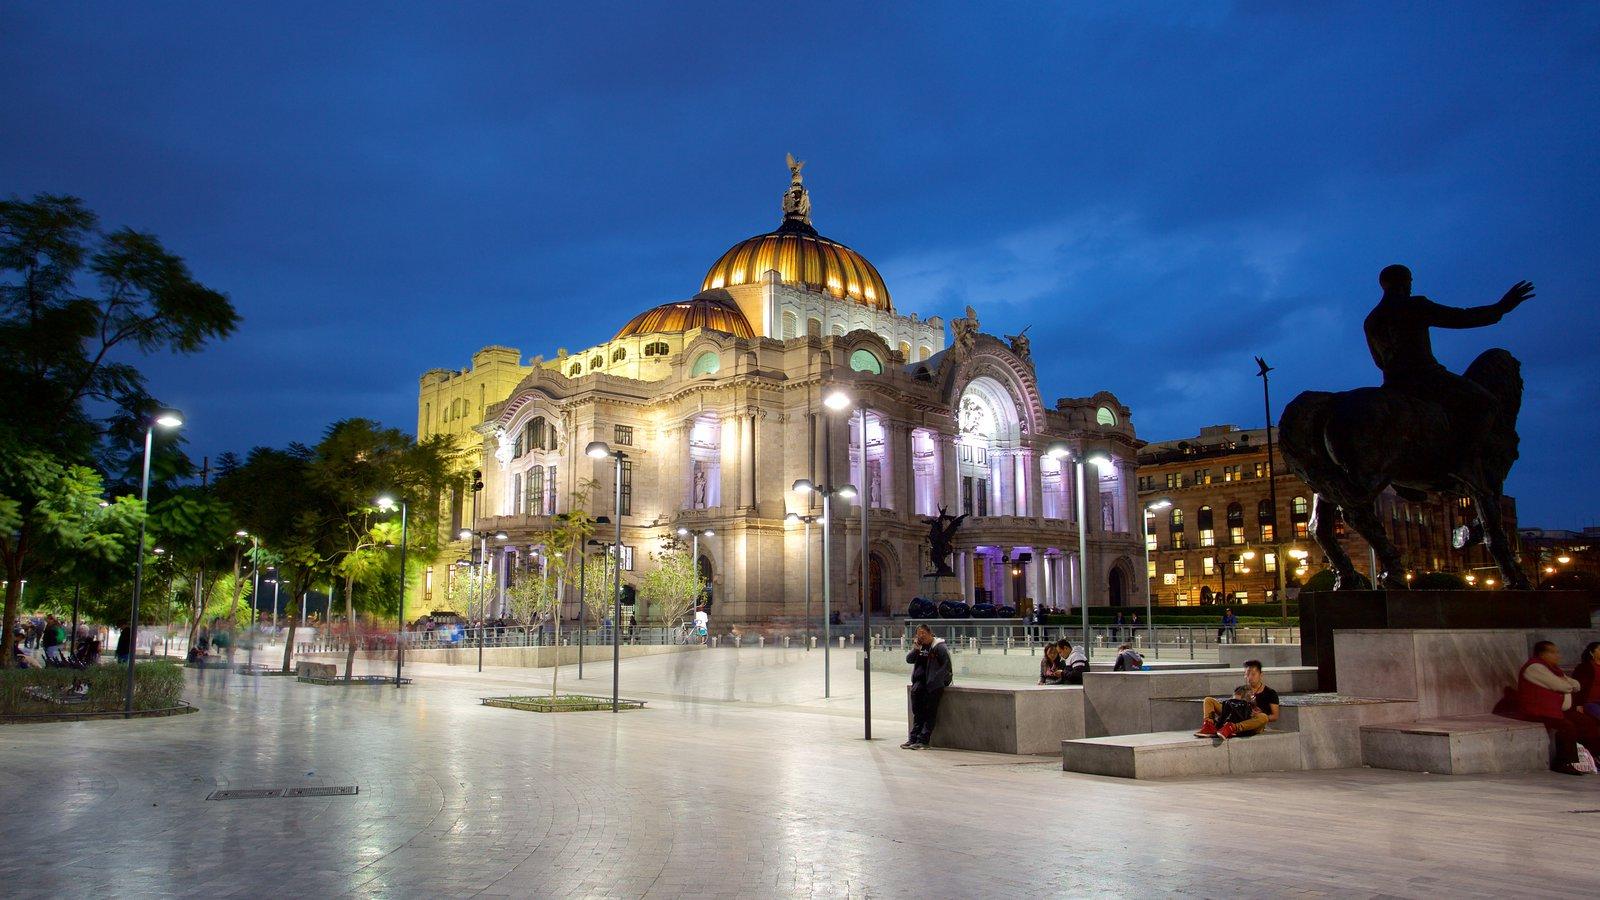 Palacio de bellas artes pictures view photos and images for Vacation to mexico city